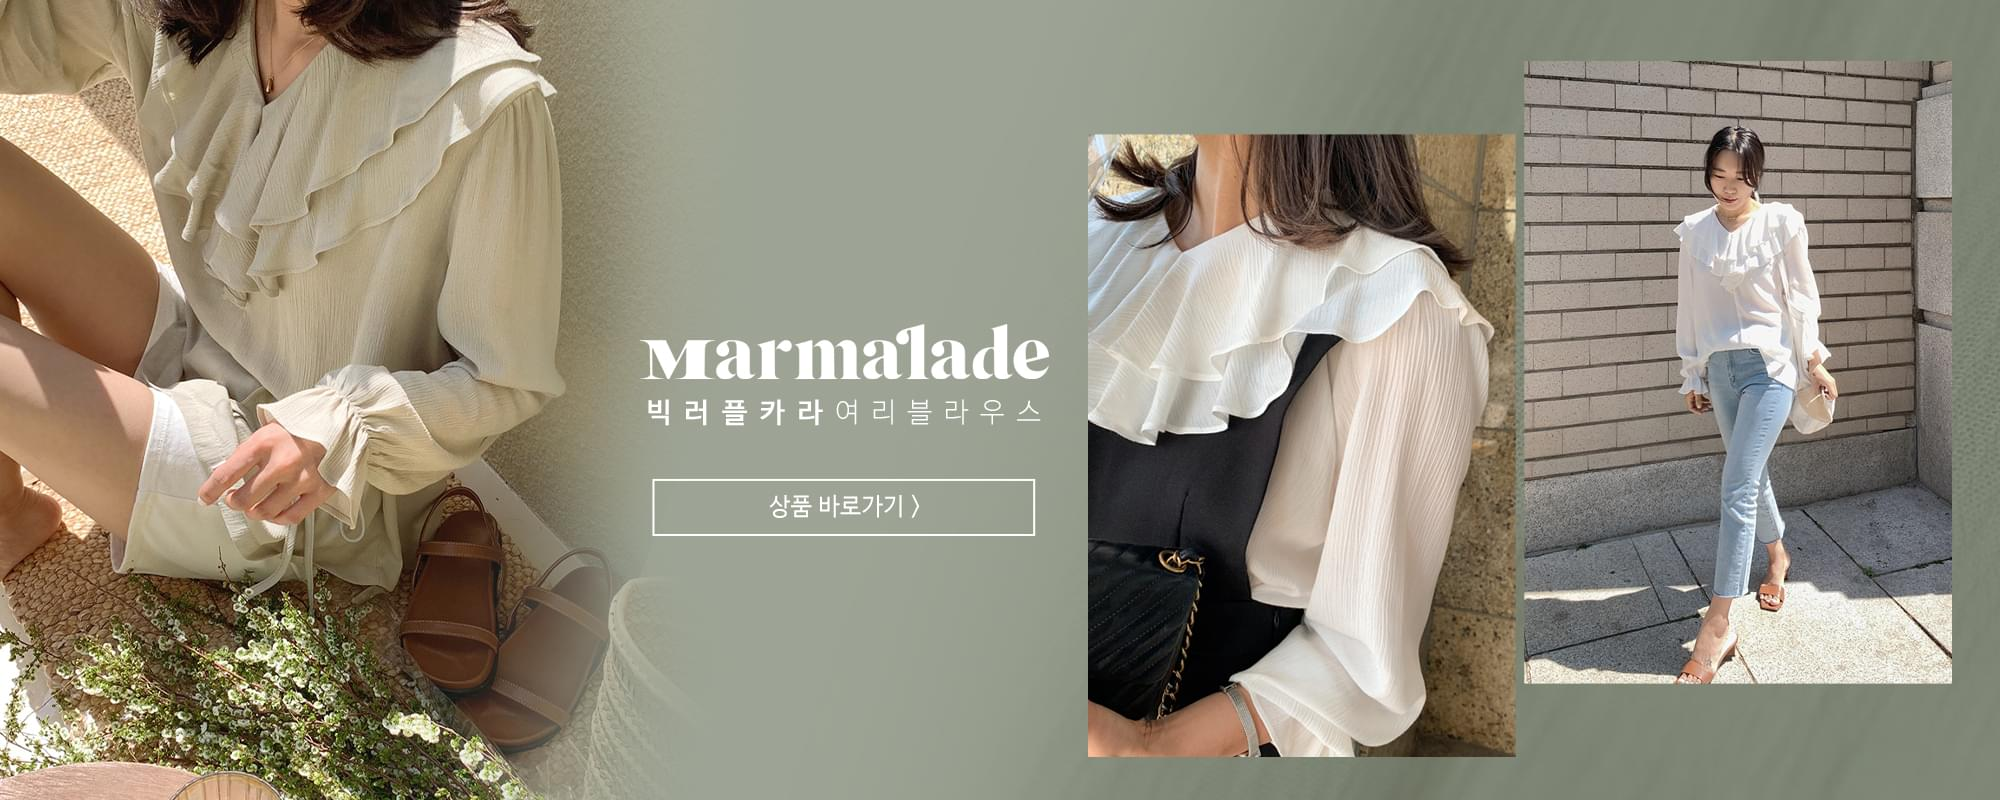 Marmalade♥.Big Ruffle Color Jelly Blouse